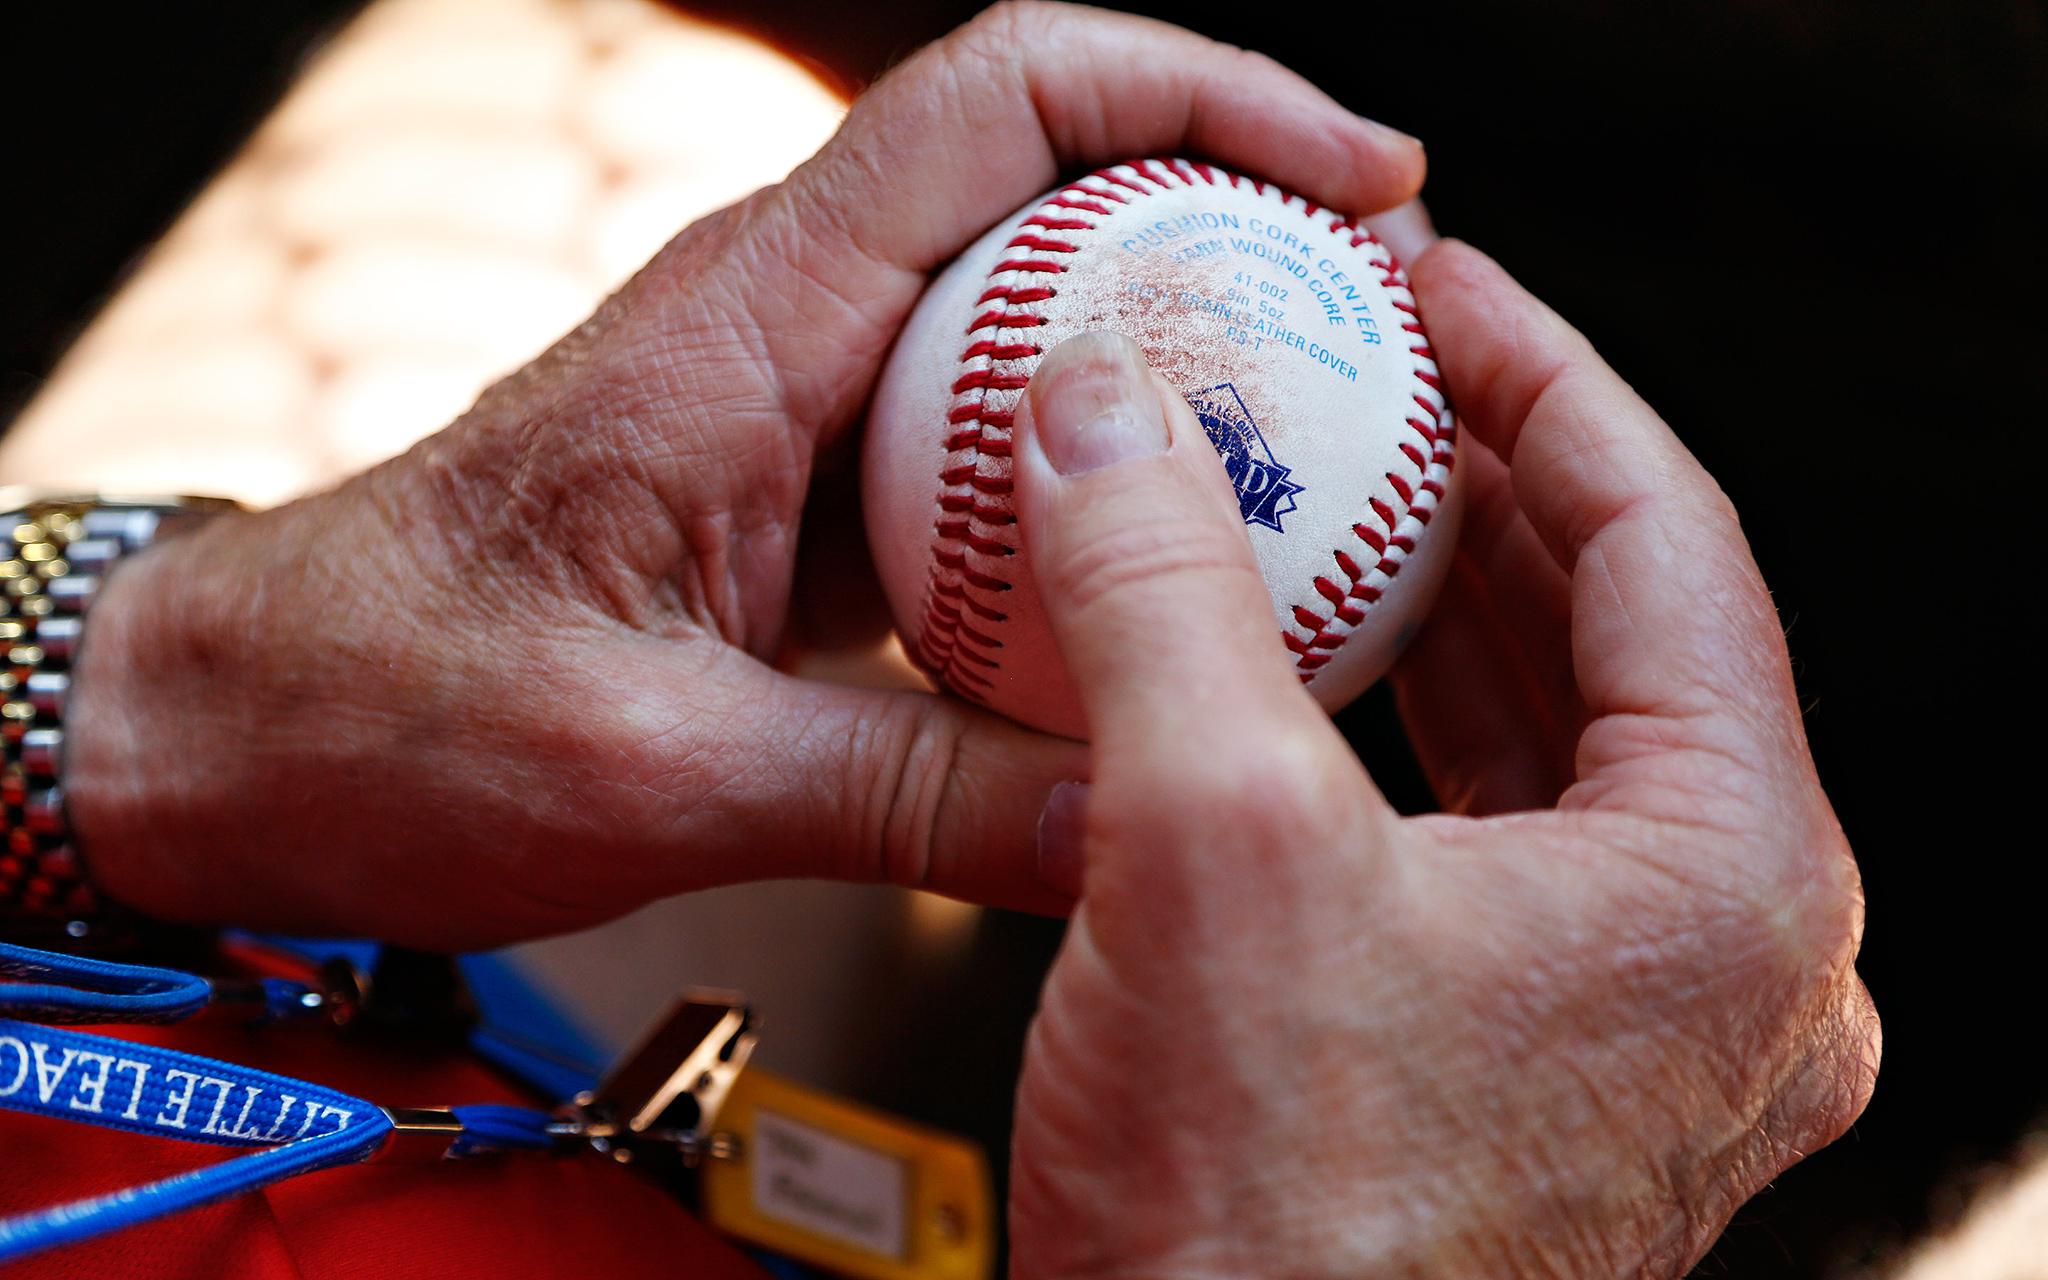 Scuffed Ball